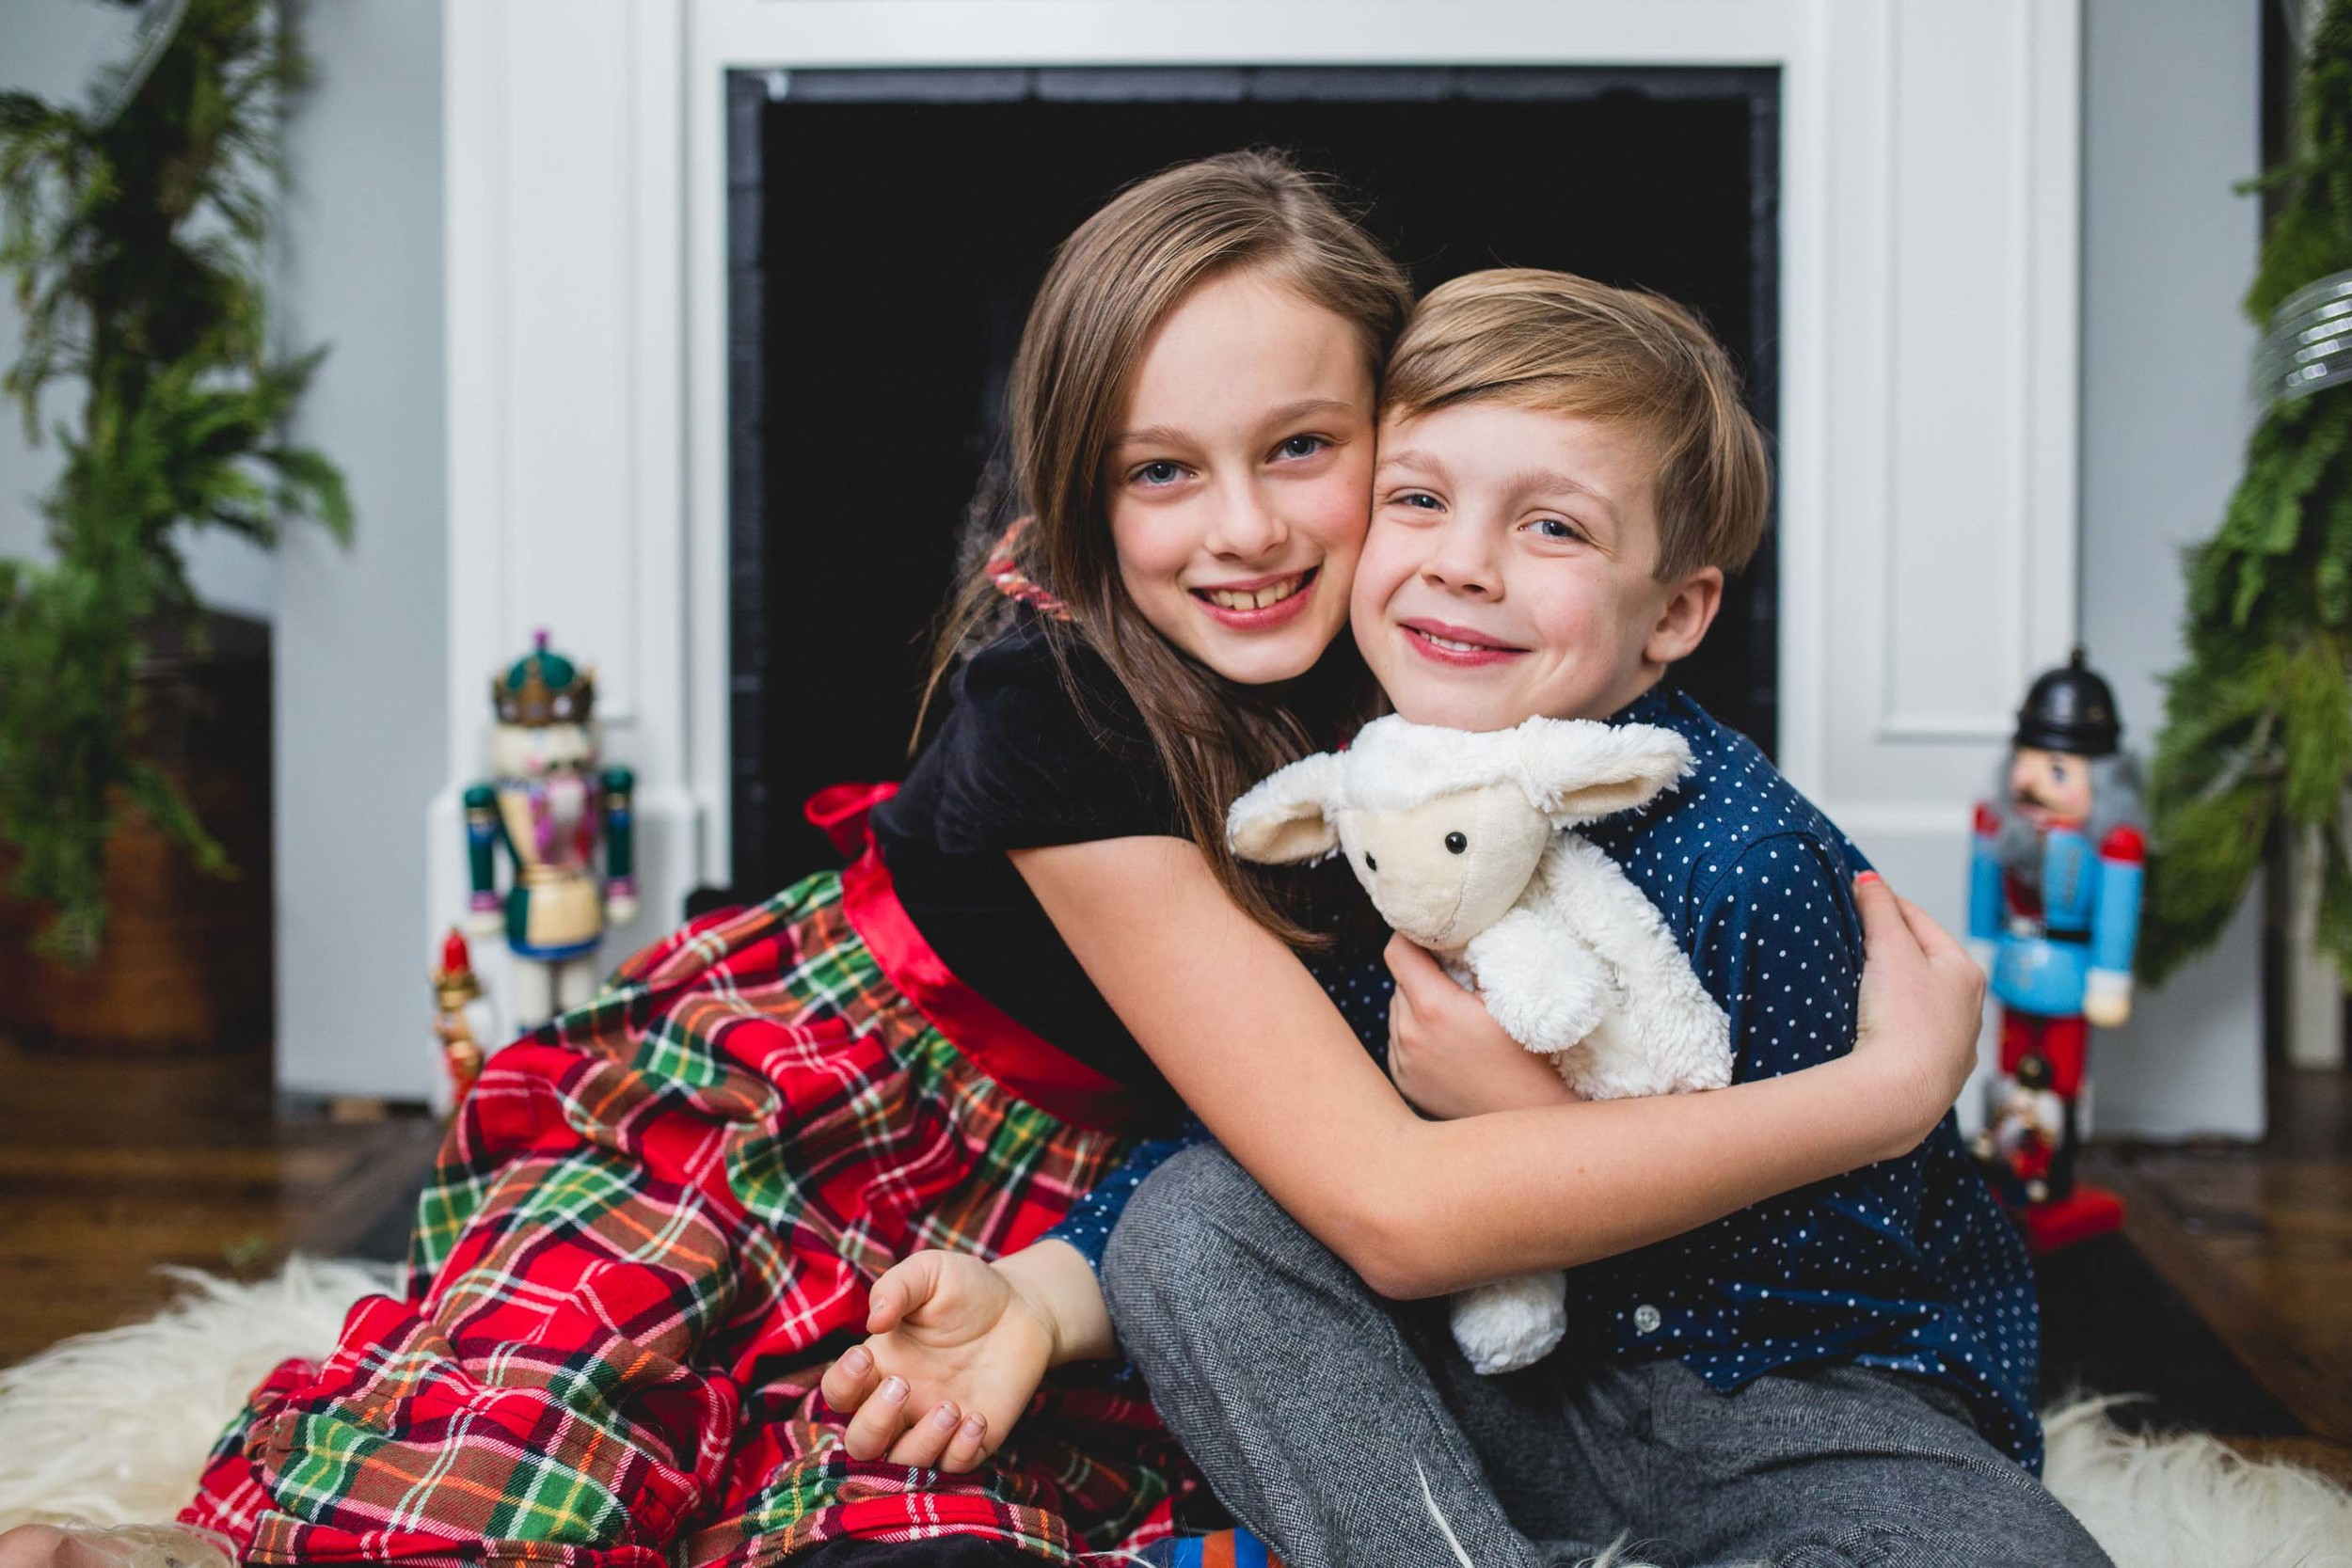 Family-Photographer-Beverly-MA-1-4.jpg